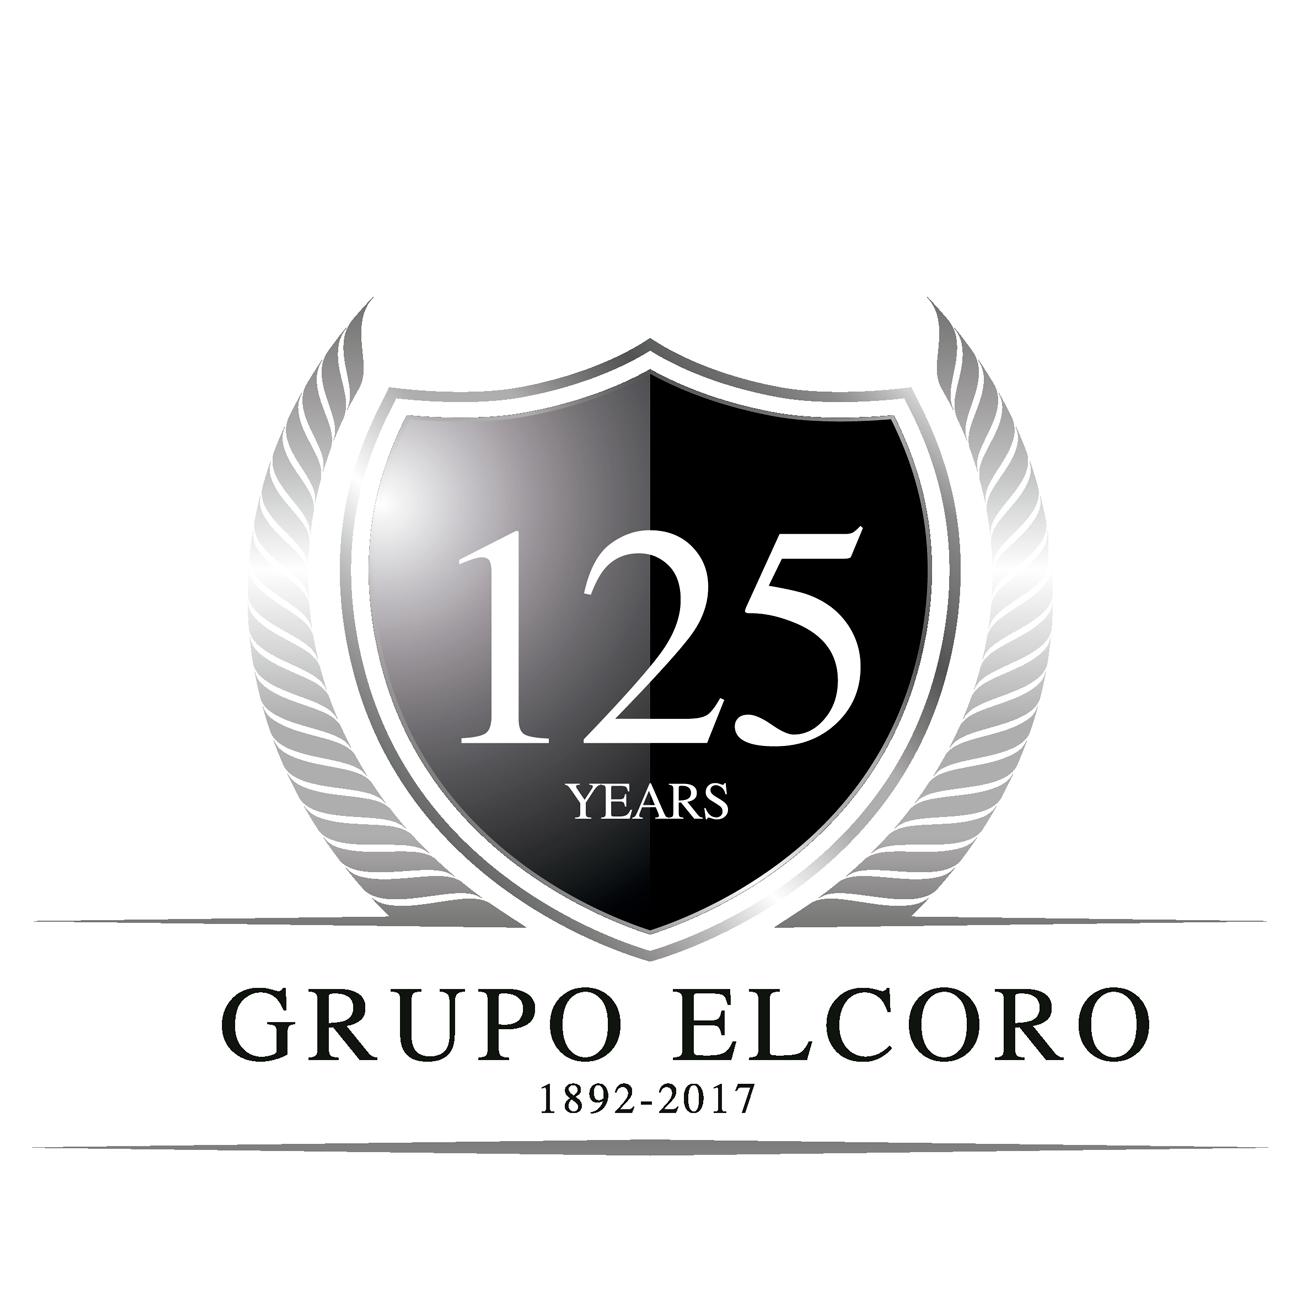 Logotipo 125 aniversario Elcoro